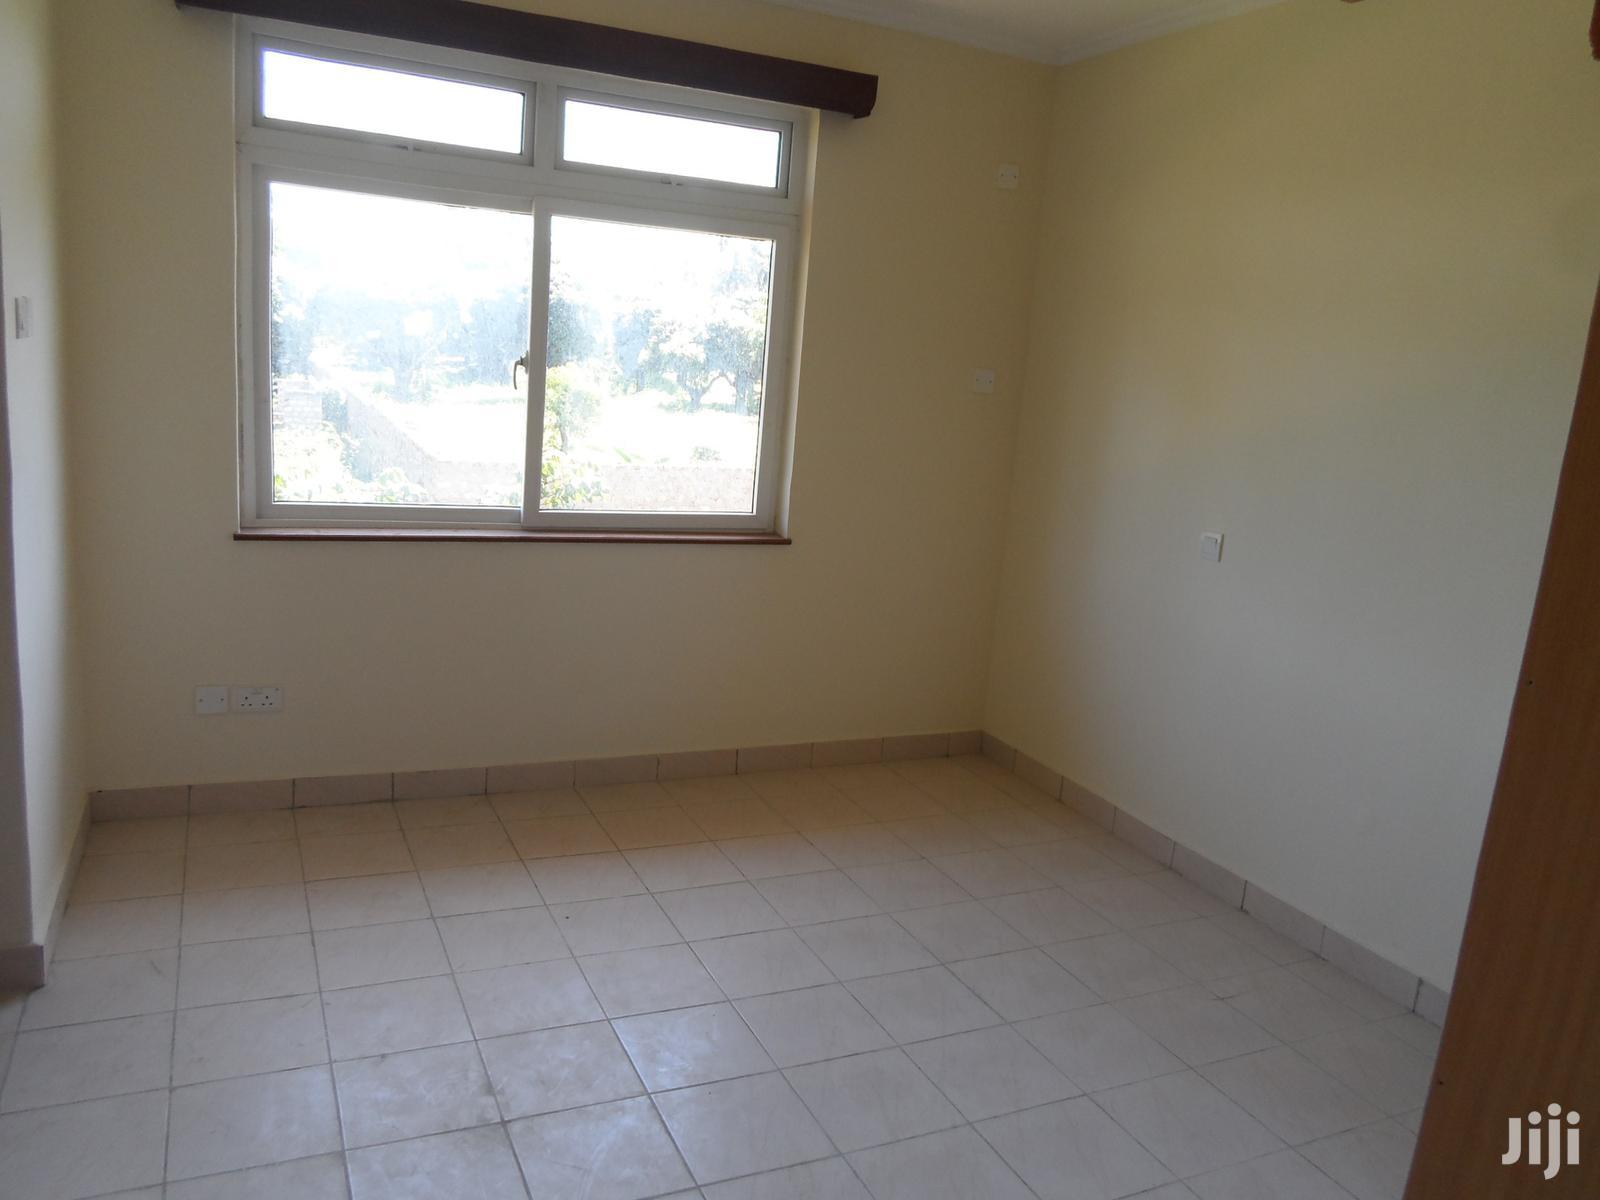 4br Villa On Sale Mtwapa/Benford Homes   Houses & Apartments For Sale for sale in Mtwapa, Kilifi, Kenya